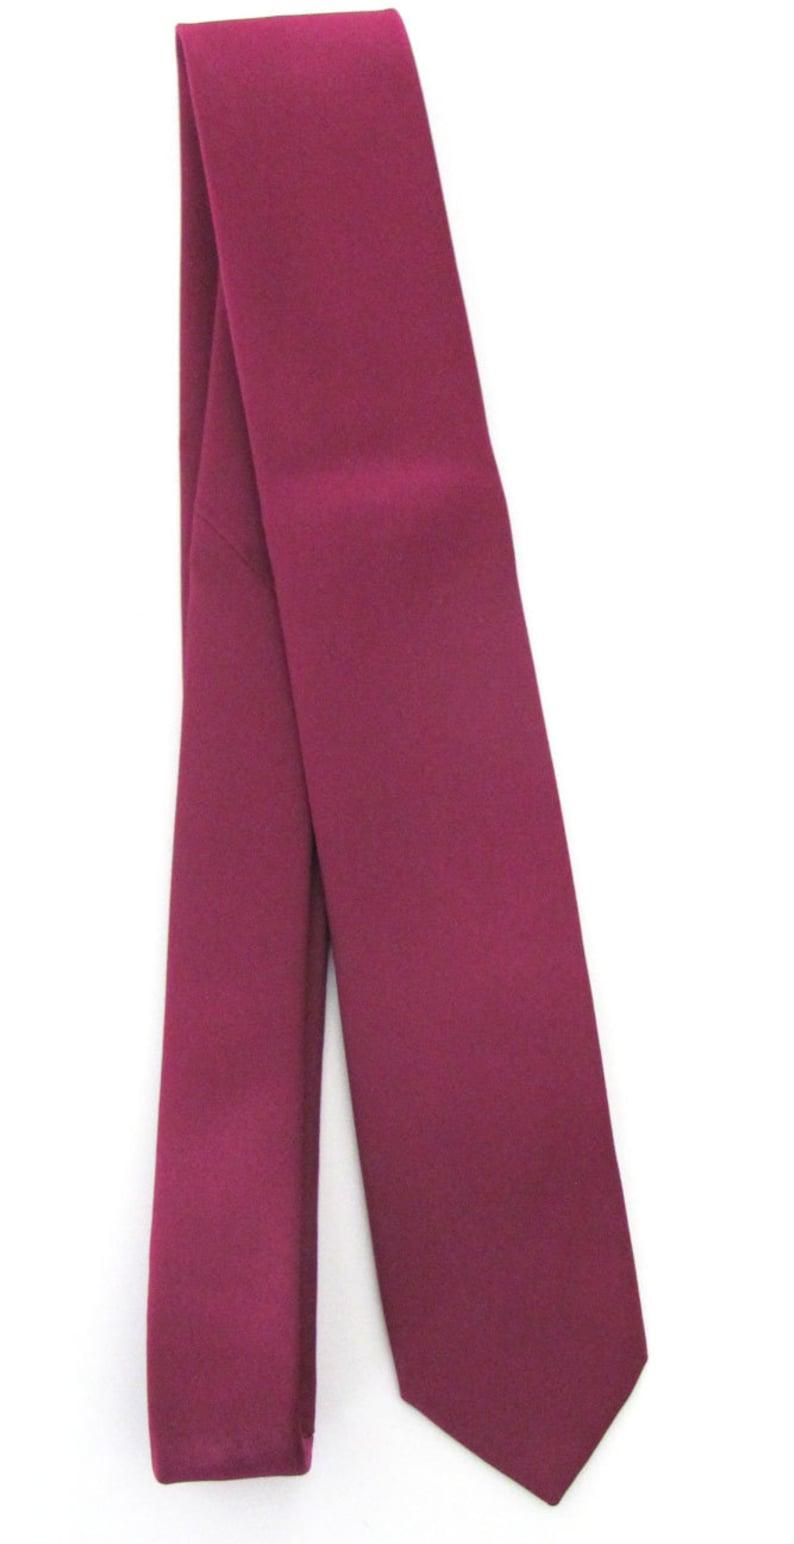 3d81eef86016 Mens Skinny Tie Spiced Wine Berry Bouquet Skinny Necktie | Etsy